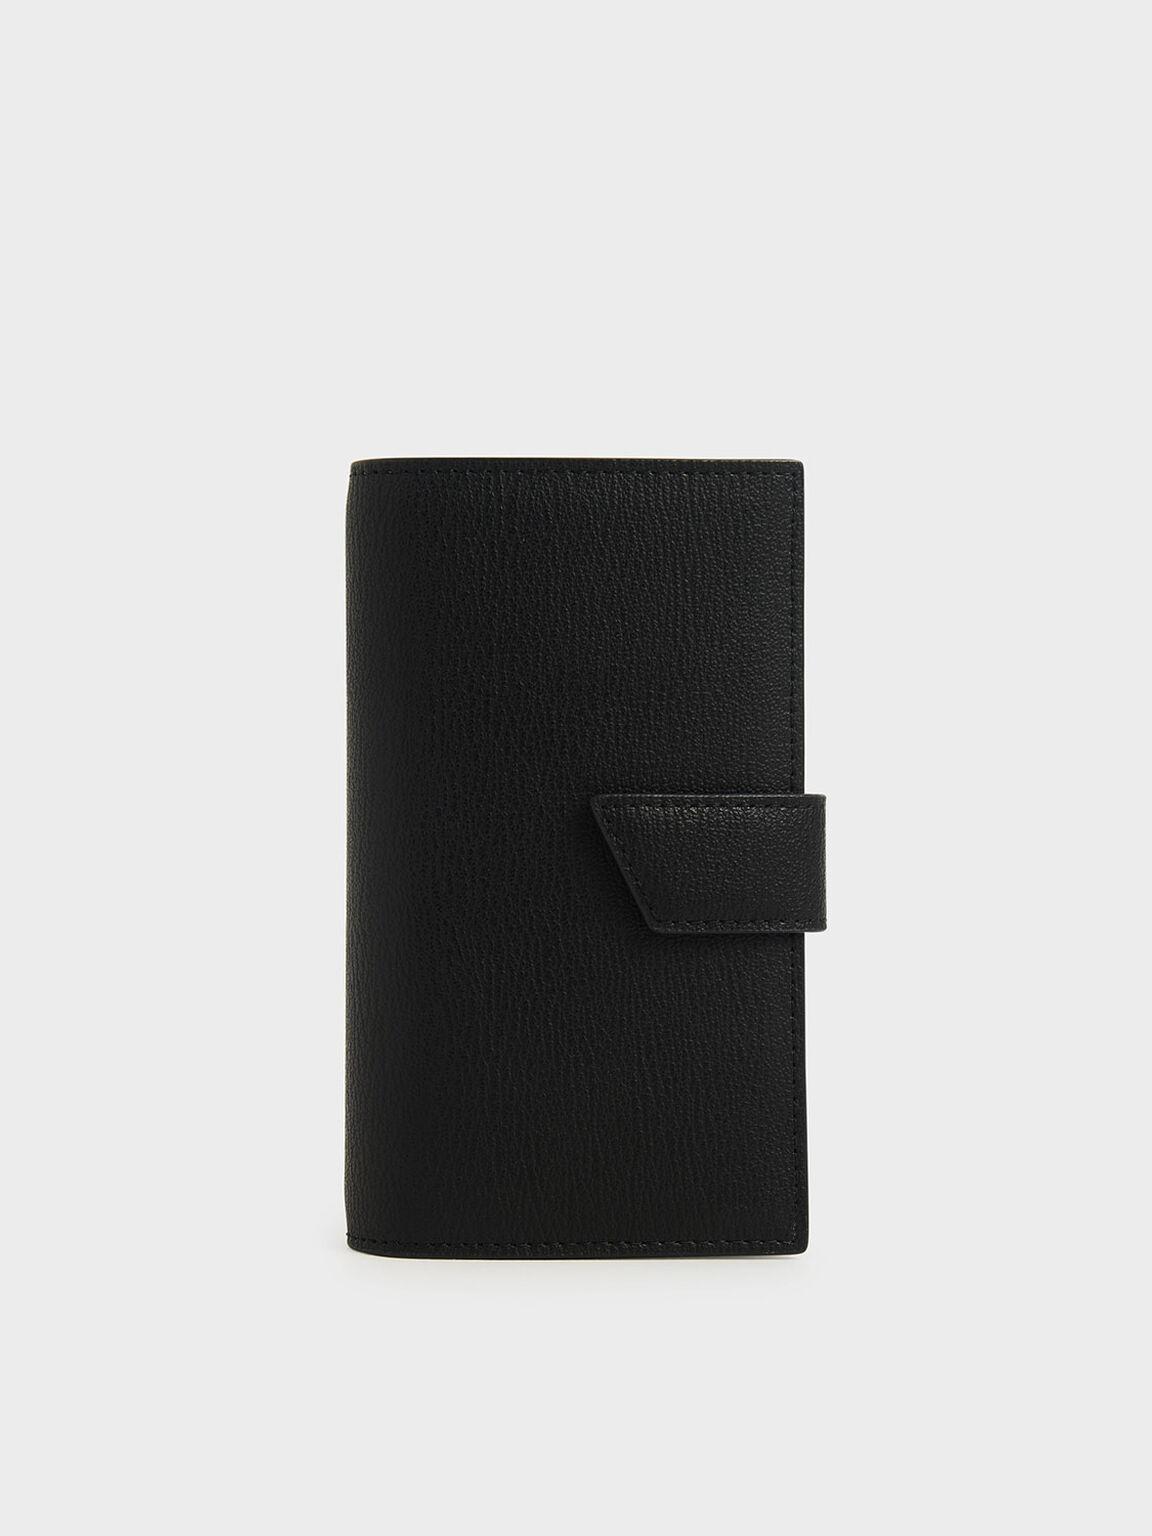 Snap Button Wallet, Black, hi-res